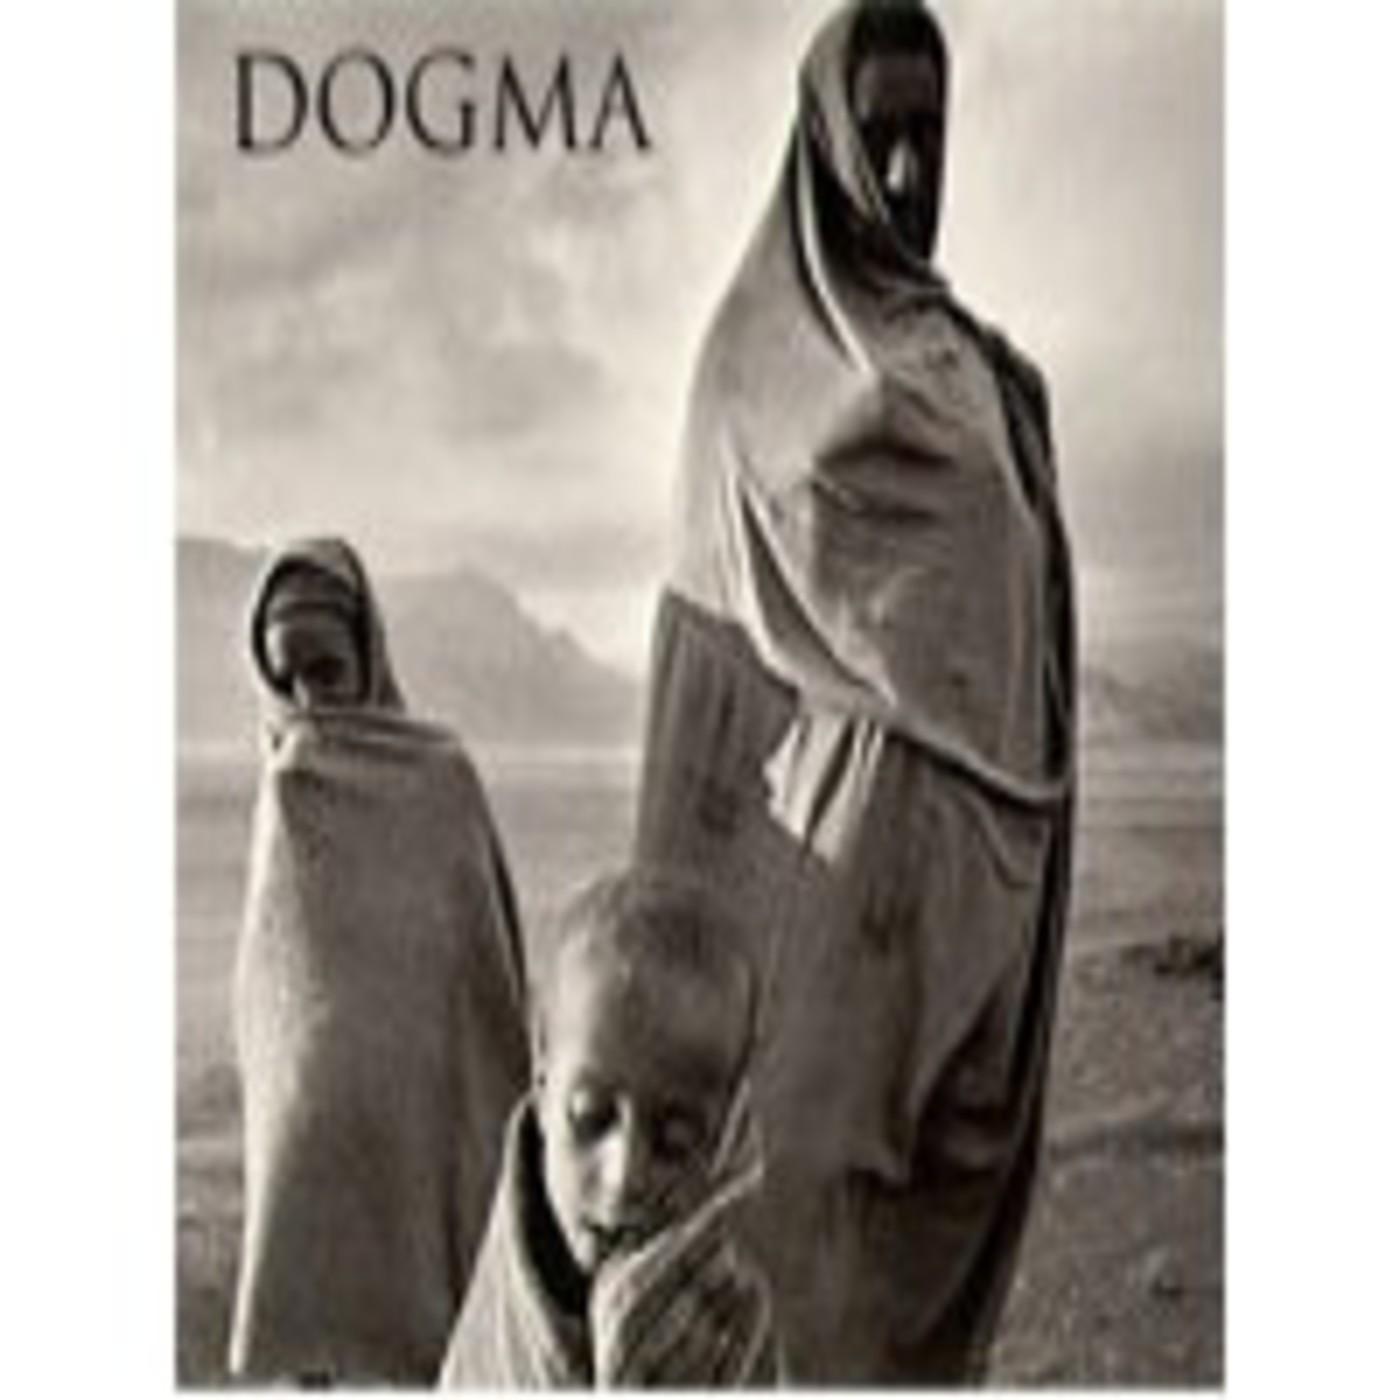 Episodio 11 - Dogma